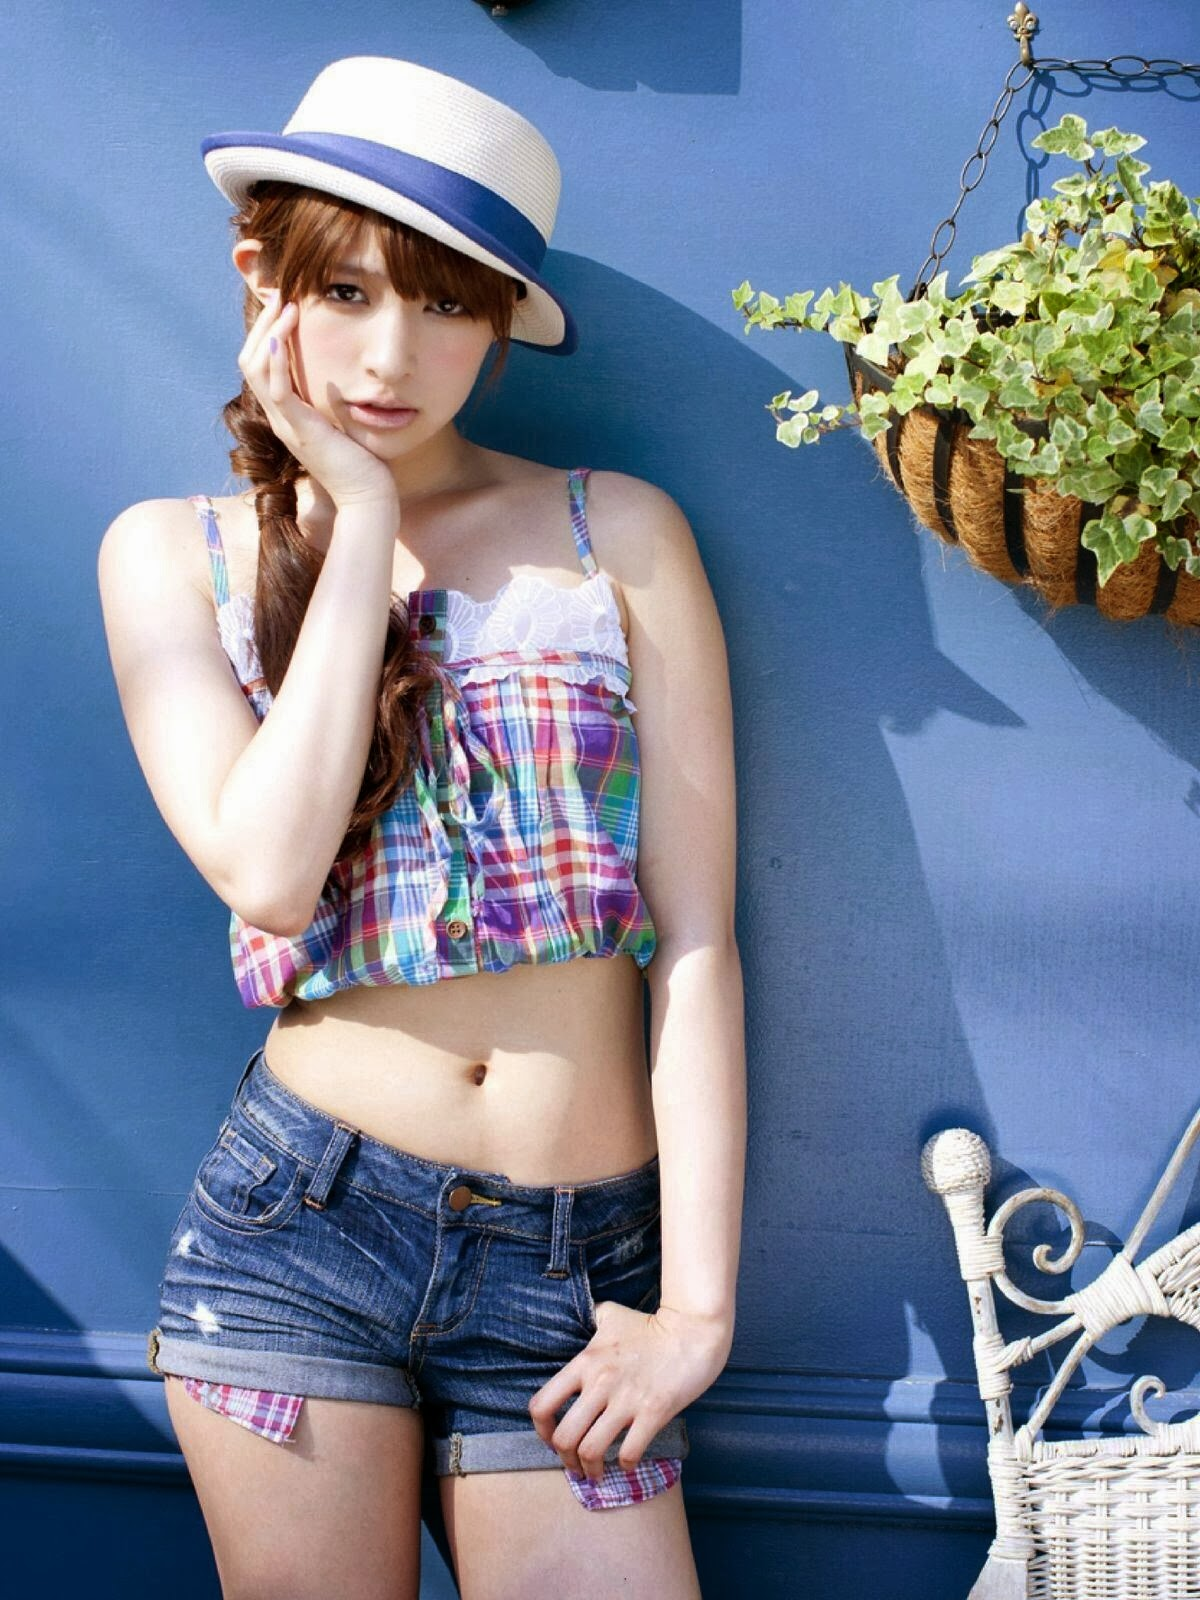 PchLounge: Japanese Girls Wear Hot Pants